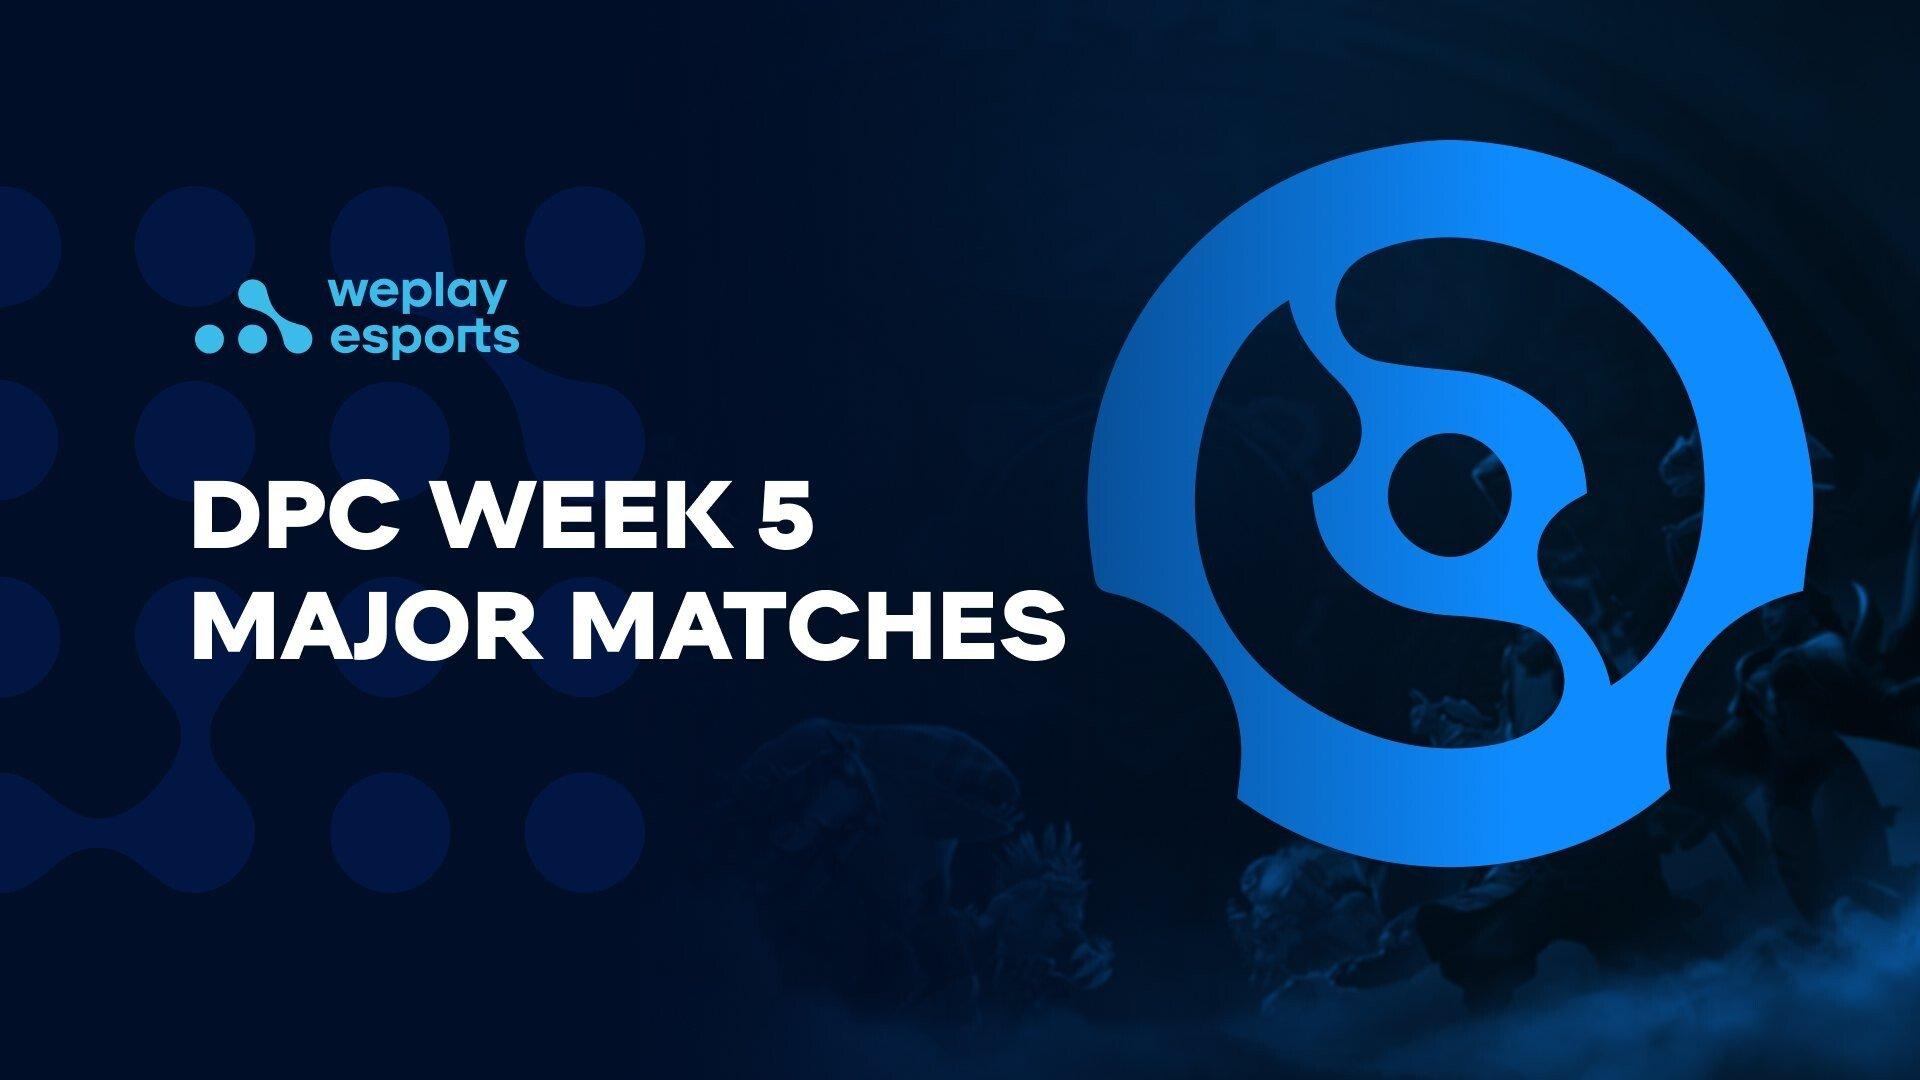 Five DPC Week 5 Major Matches